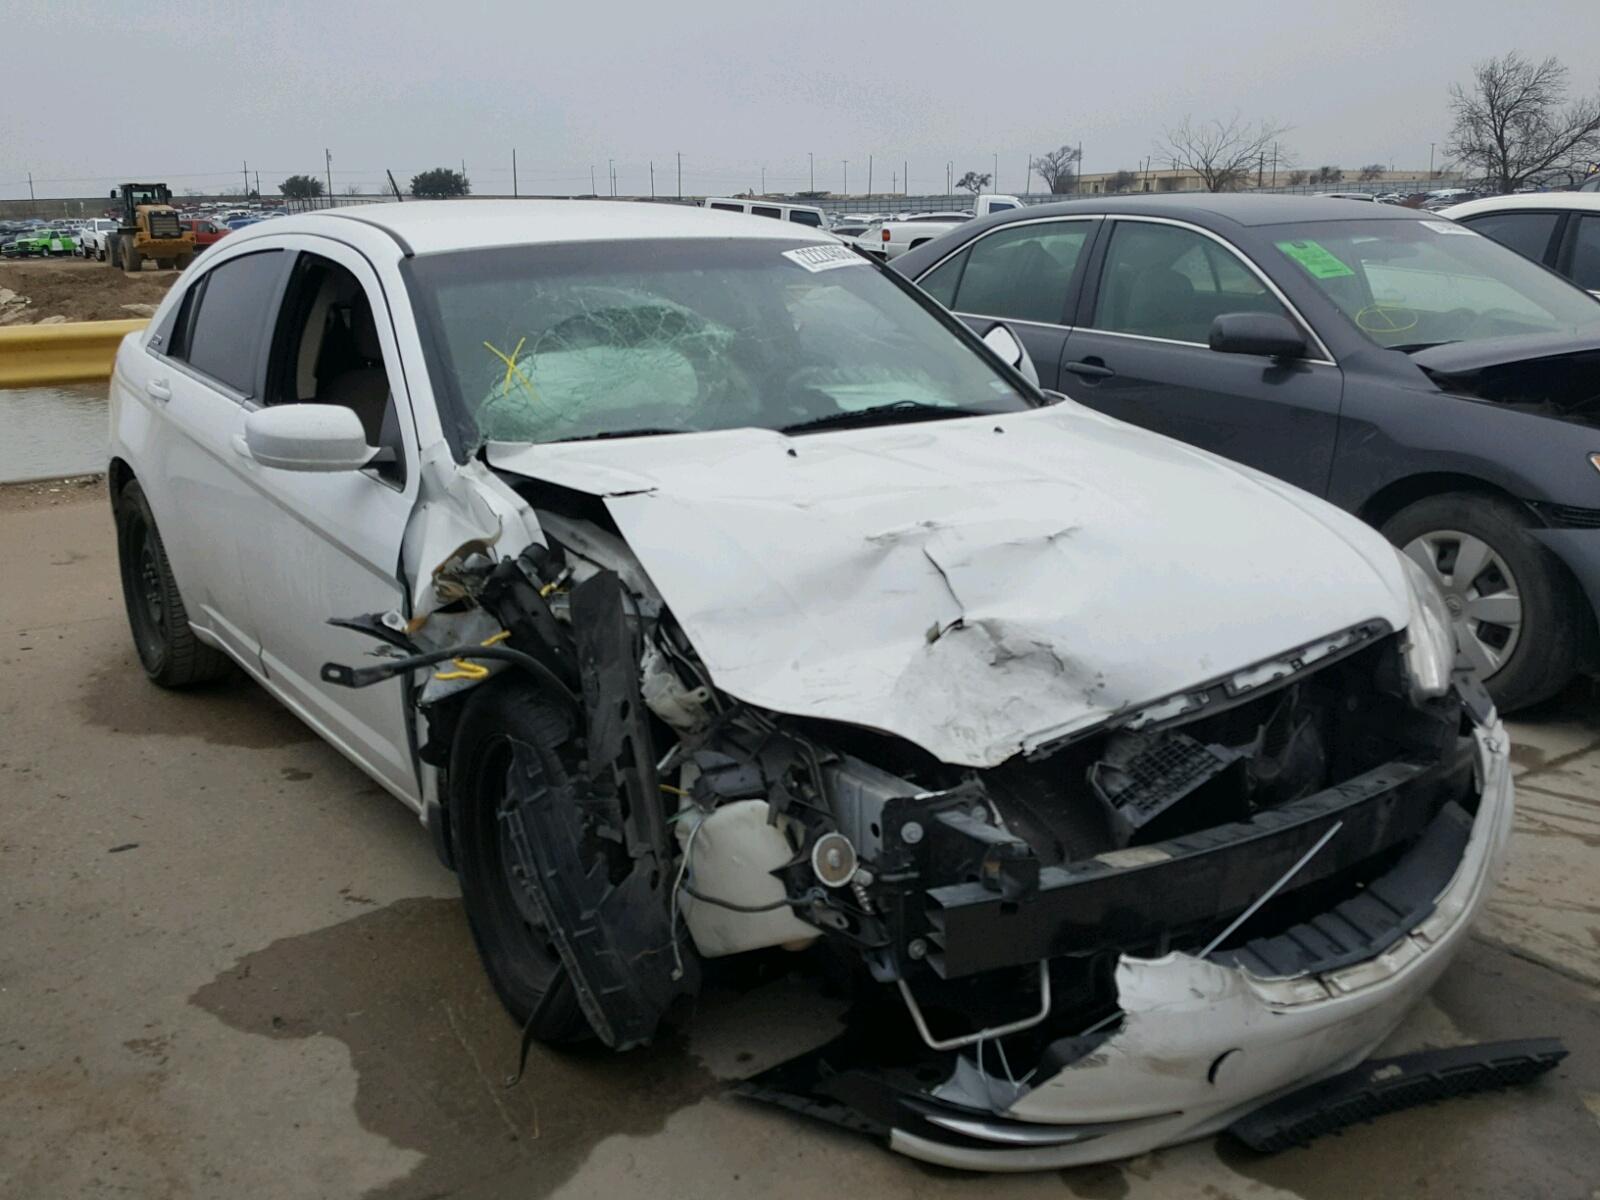 us mapquest tx ram dallas lbj chrysler freeway auto business dealers jeep texas dodge